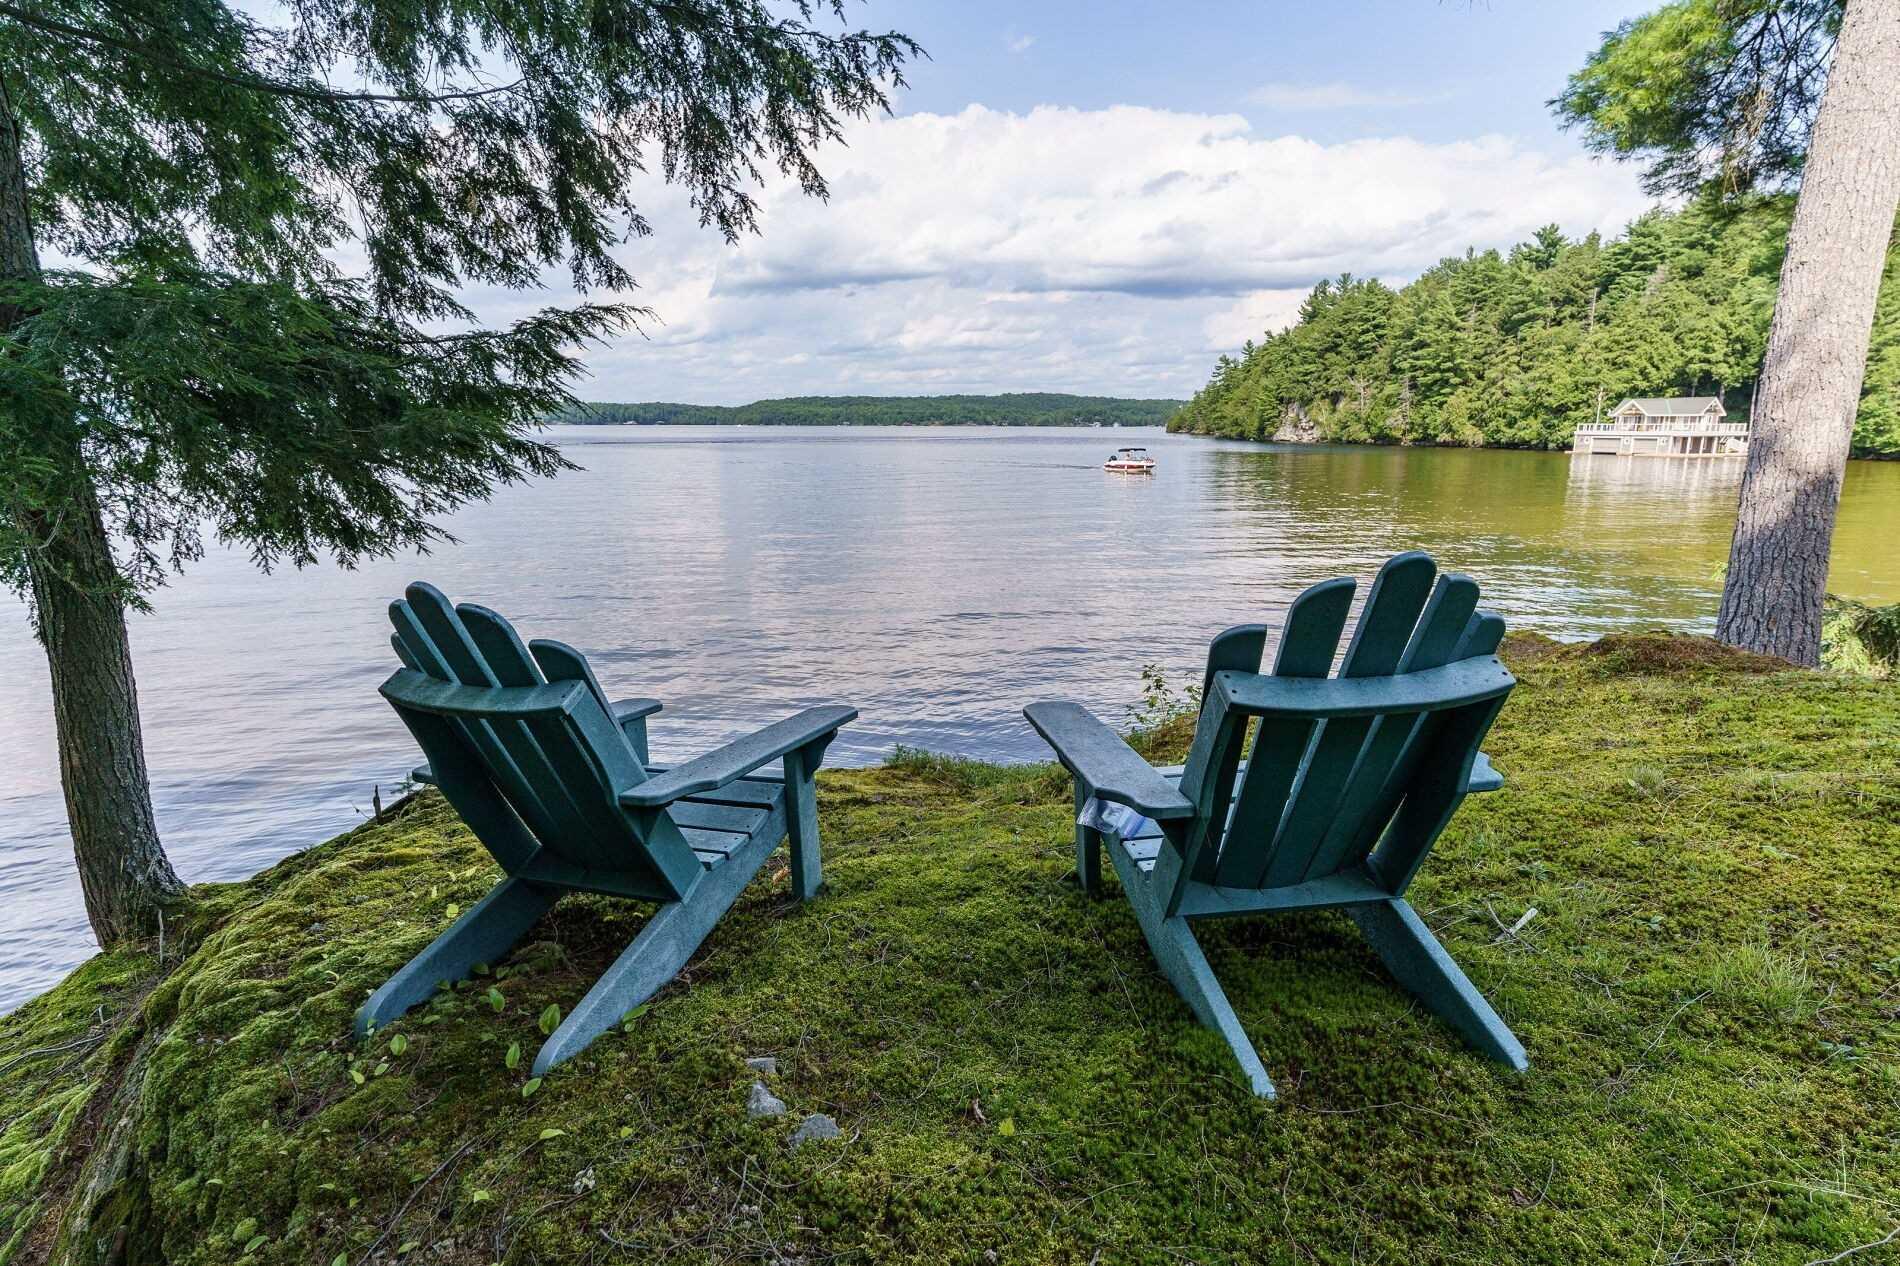 1553 #8 Juddhaven Rd, Muskoka Lakes, Ontario P0B 1J0, 4 Bedrooms Bedrooms, 6 Rooms Rooms,1 BathroomBathrooms,Detached,For Sale,Juddhaven,X5323735